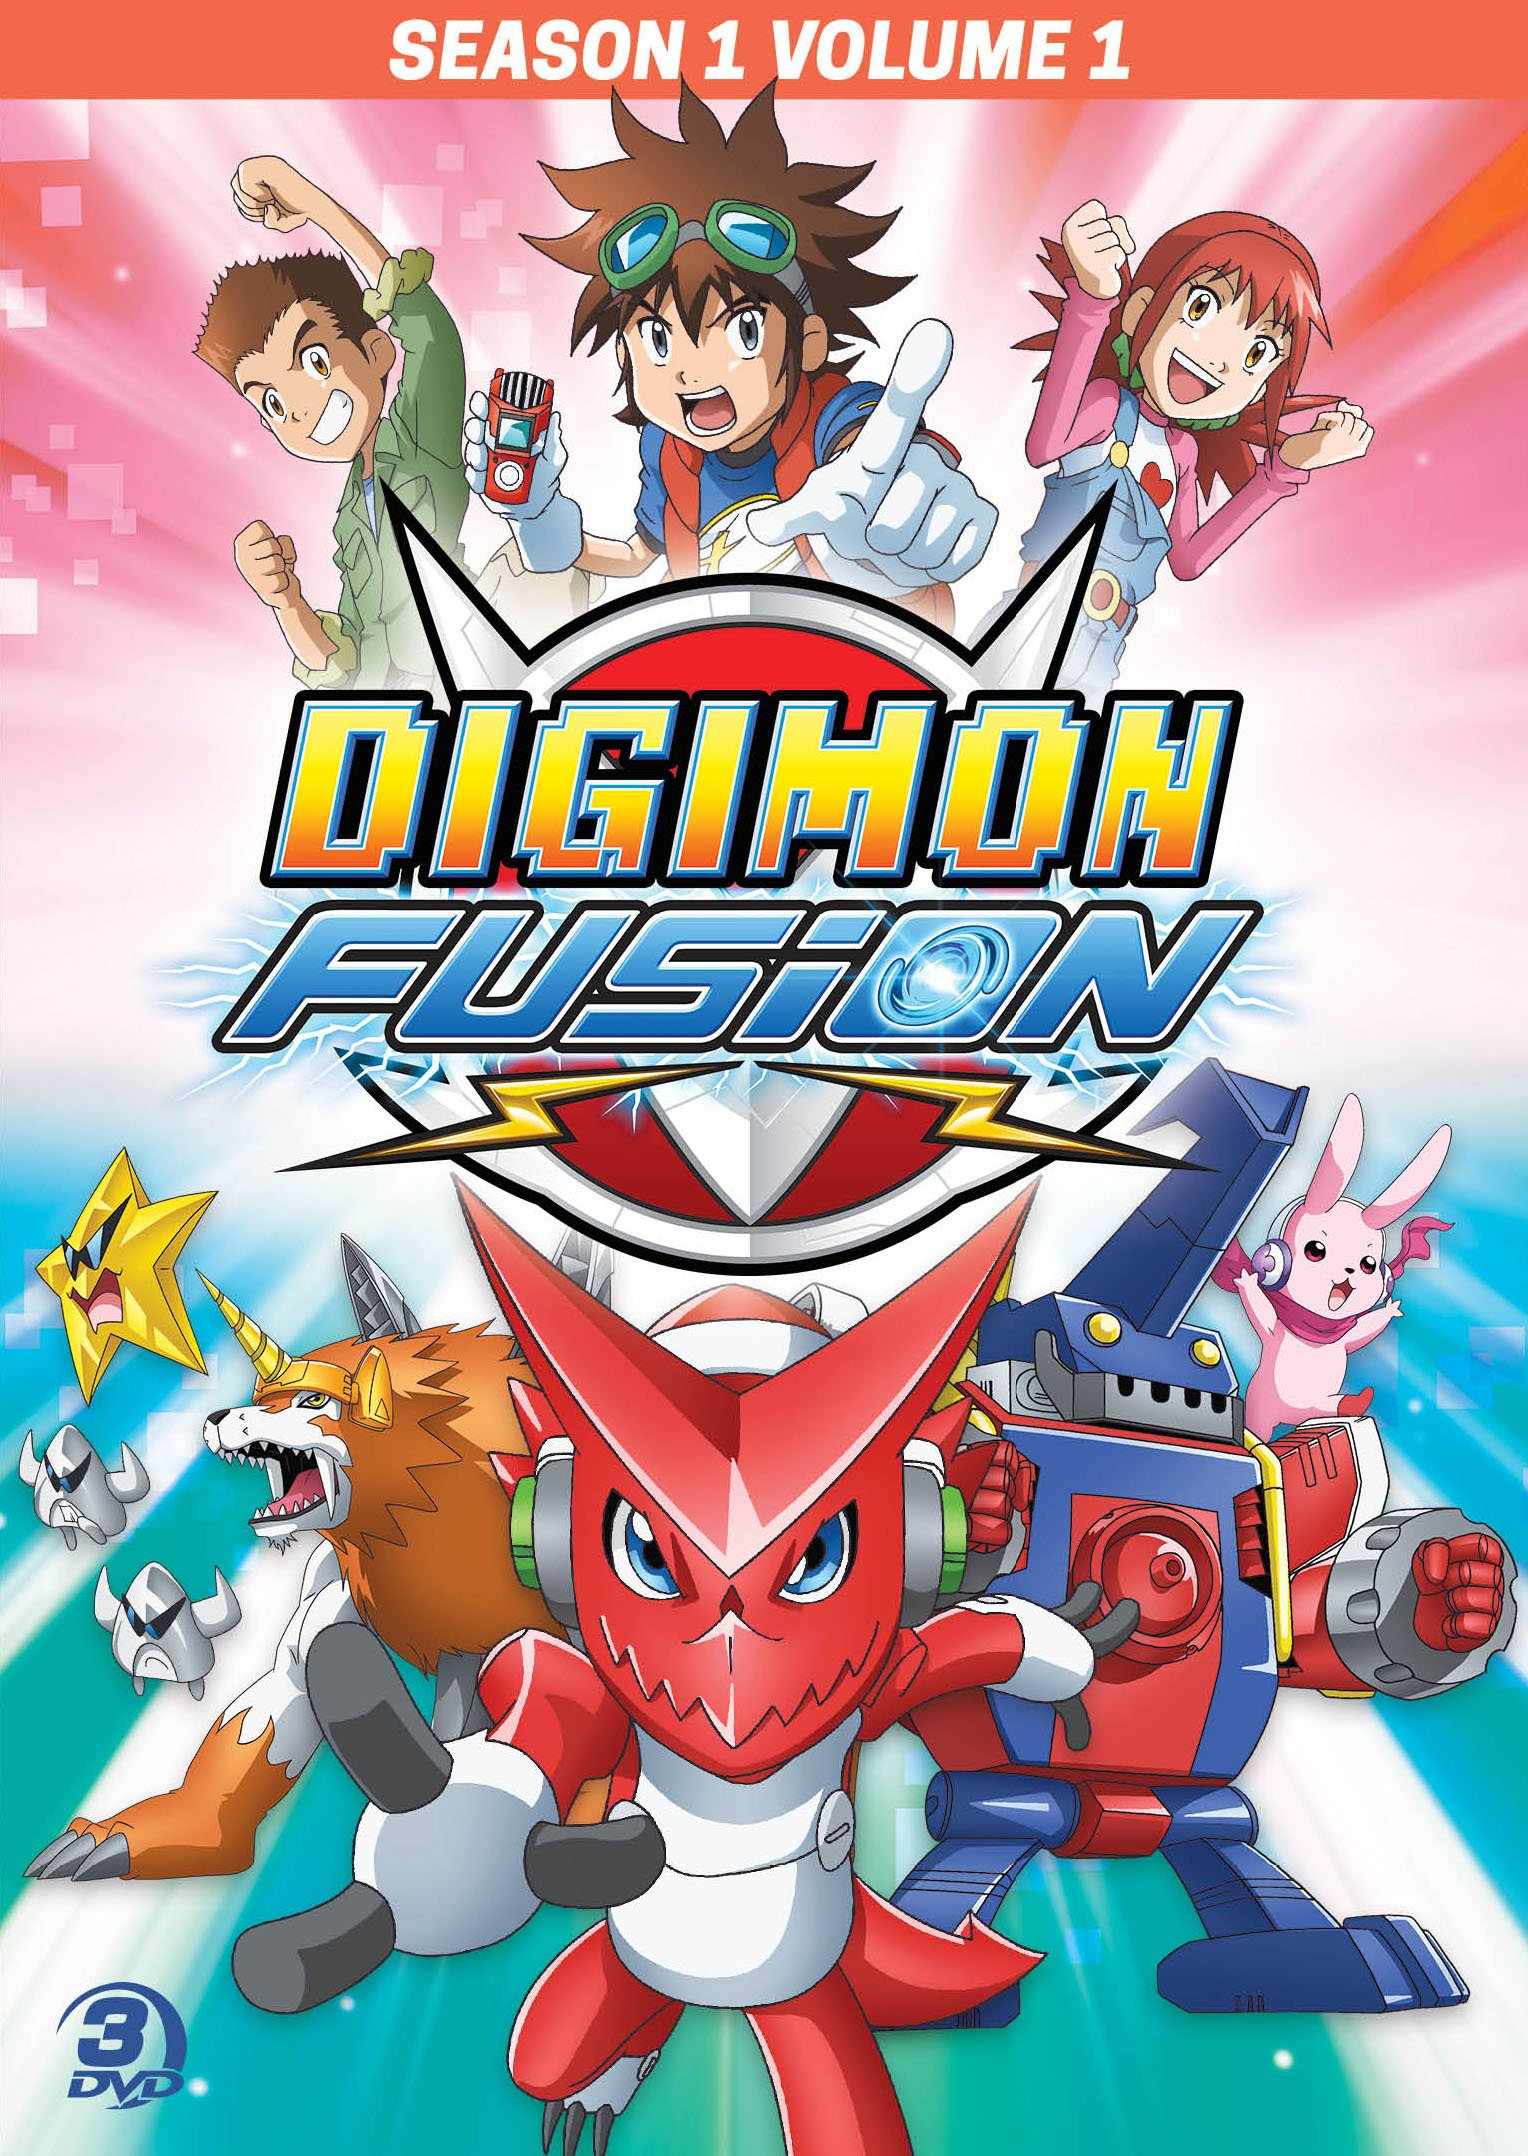 Digimon Fusion: Season 1, Vol. 1 (Widescreen, 3 Pack, 3PC)